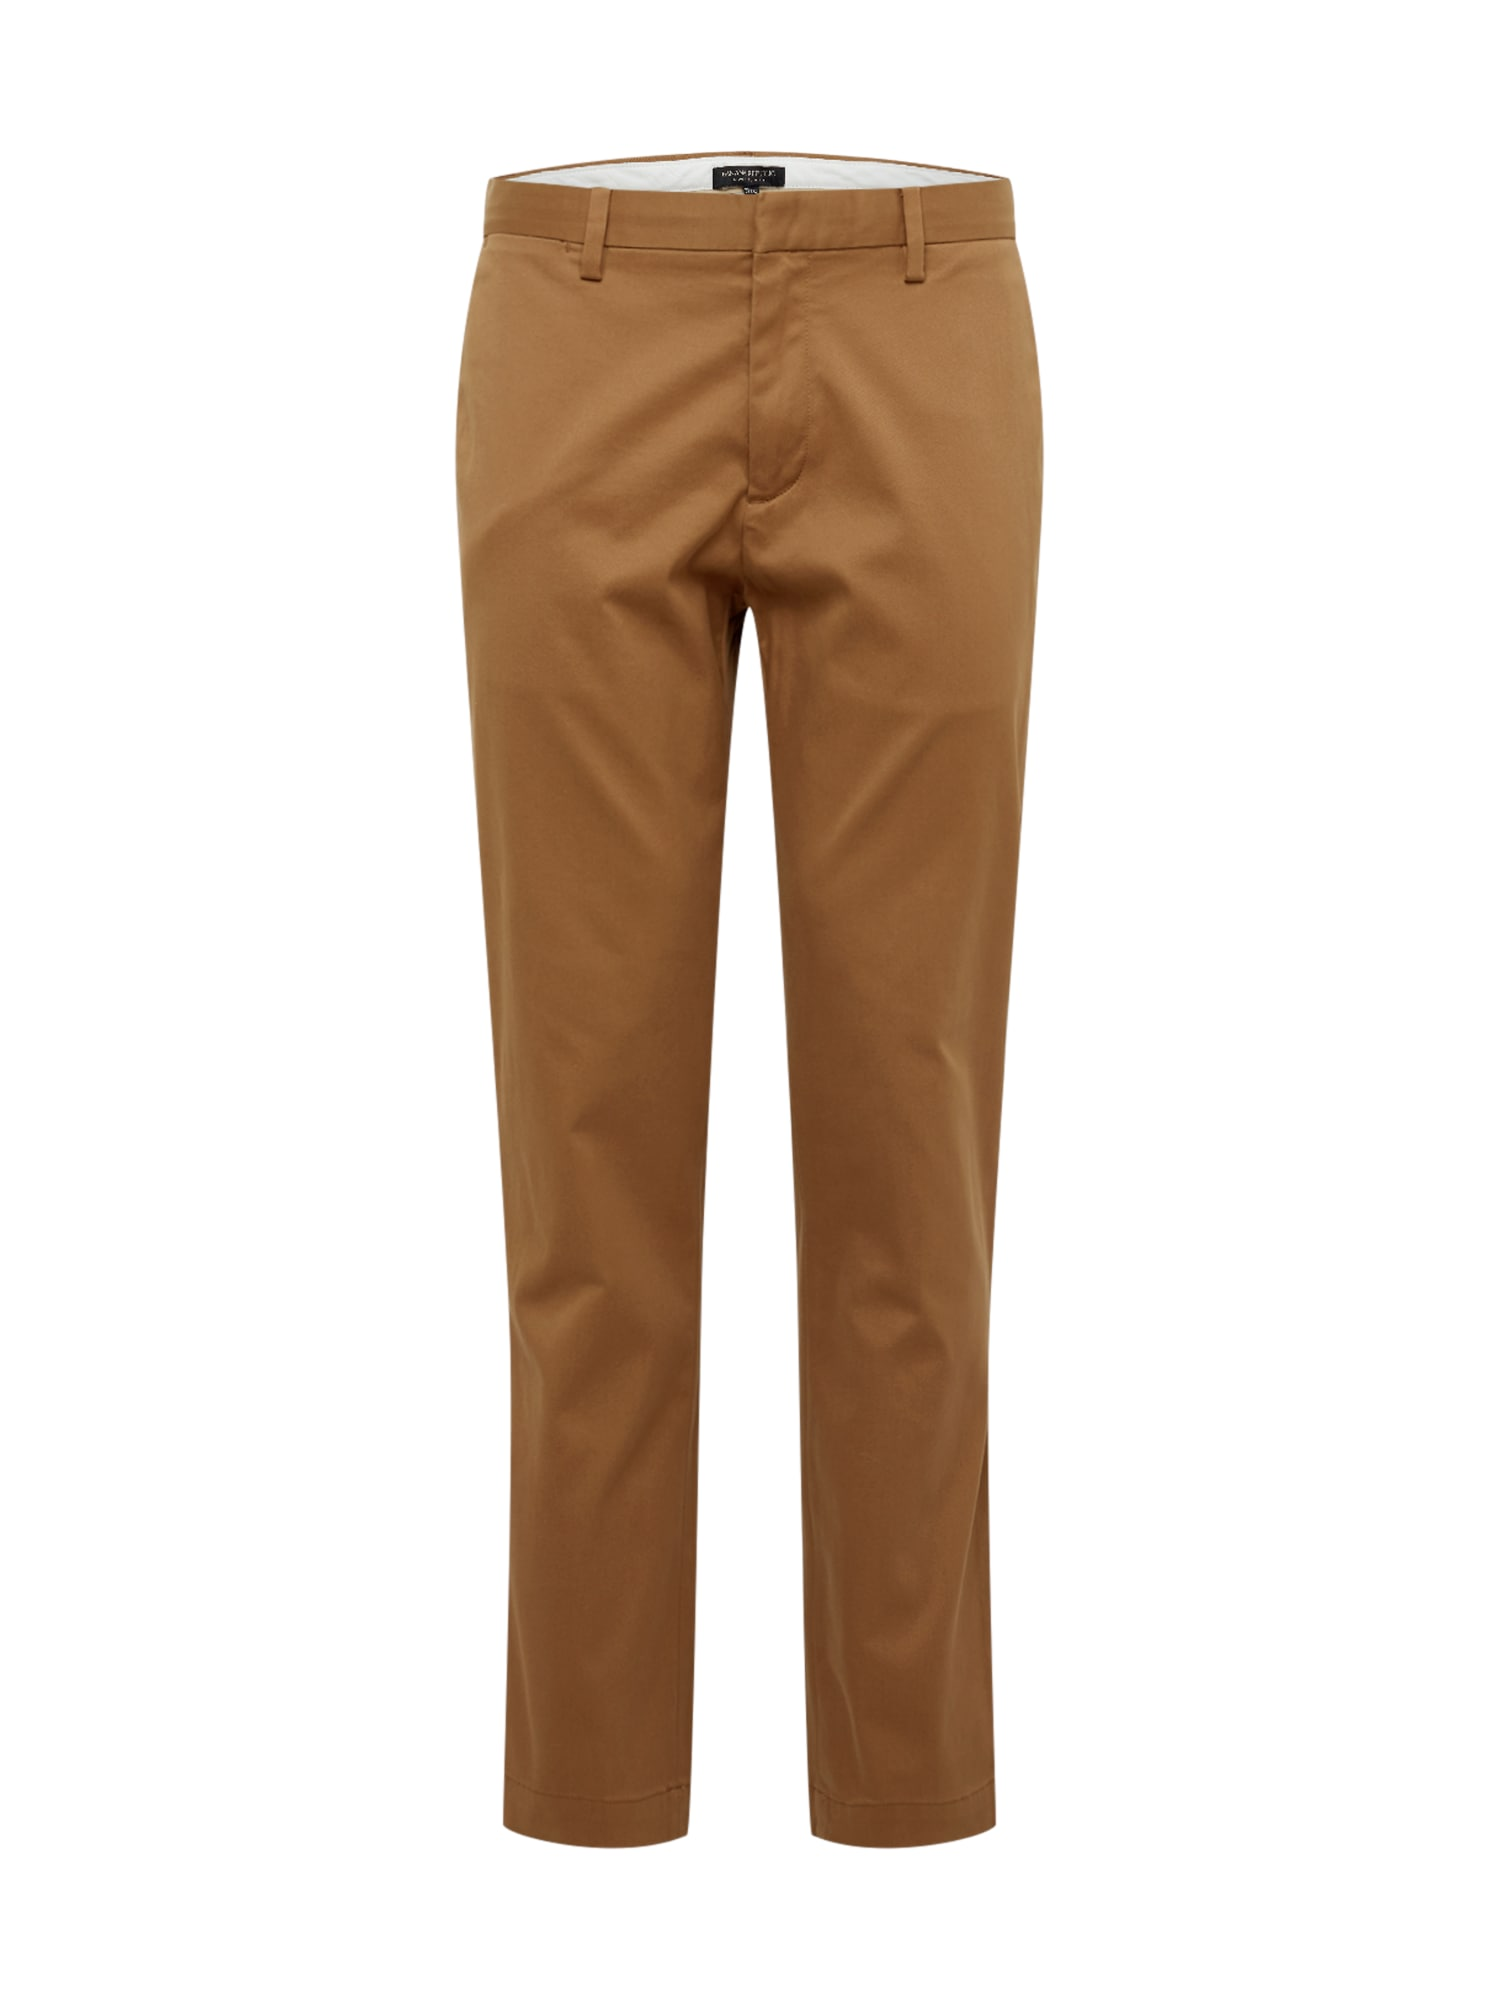 Banana Republic Chino stiliaus kelnės 'AIDEN RMC' karamelės